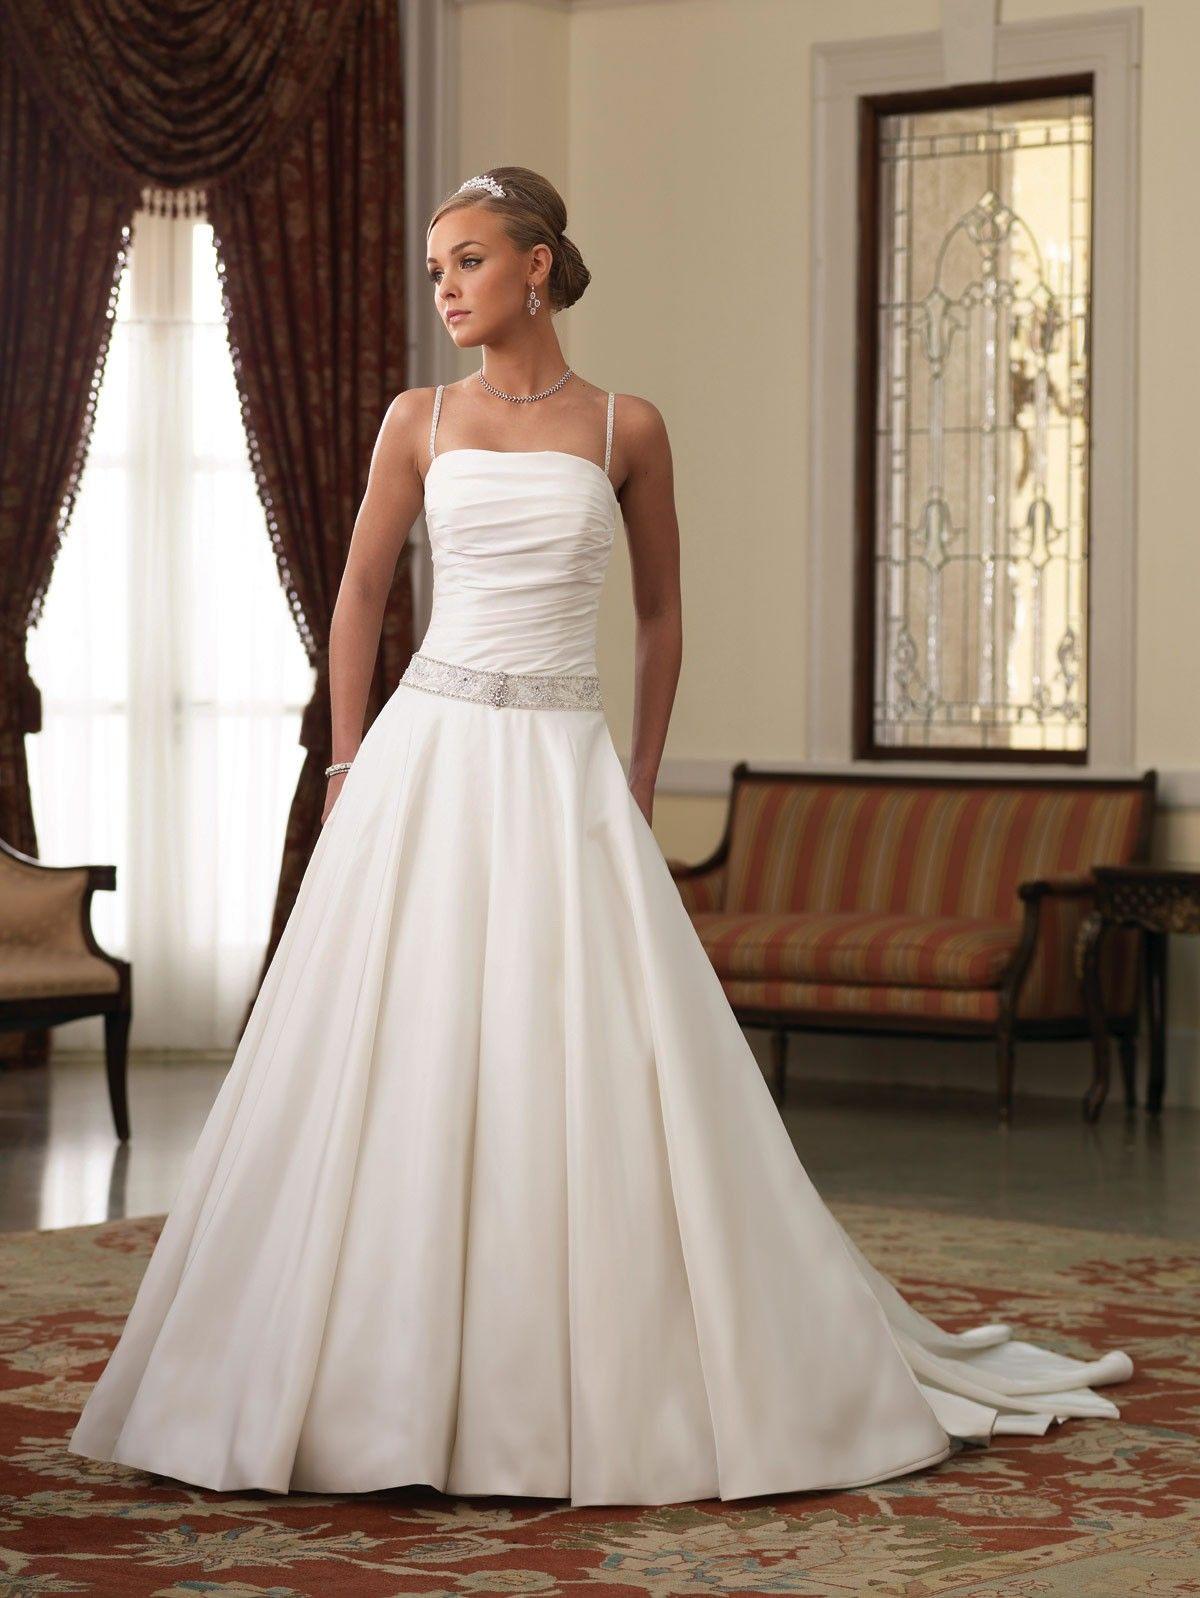 Dress for wedding party female  Taffeta Spaghetti Straps Neckline Directionally Pleated Bodice Ball